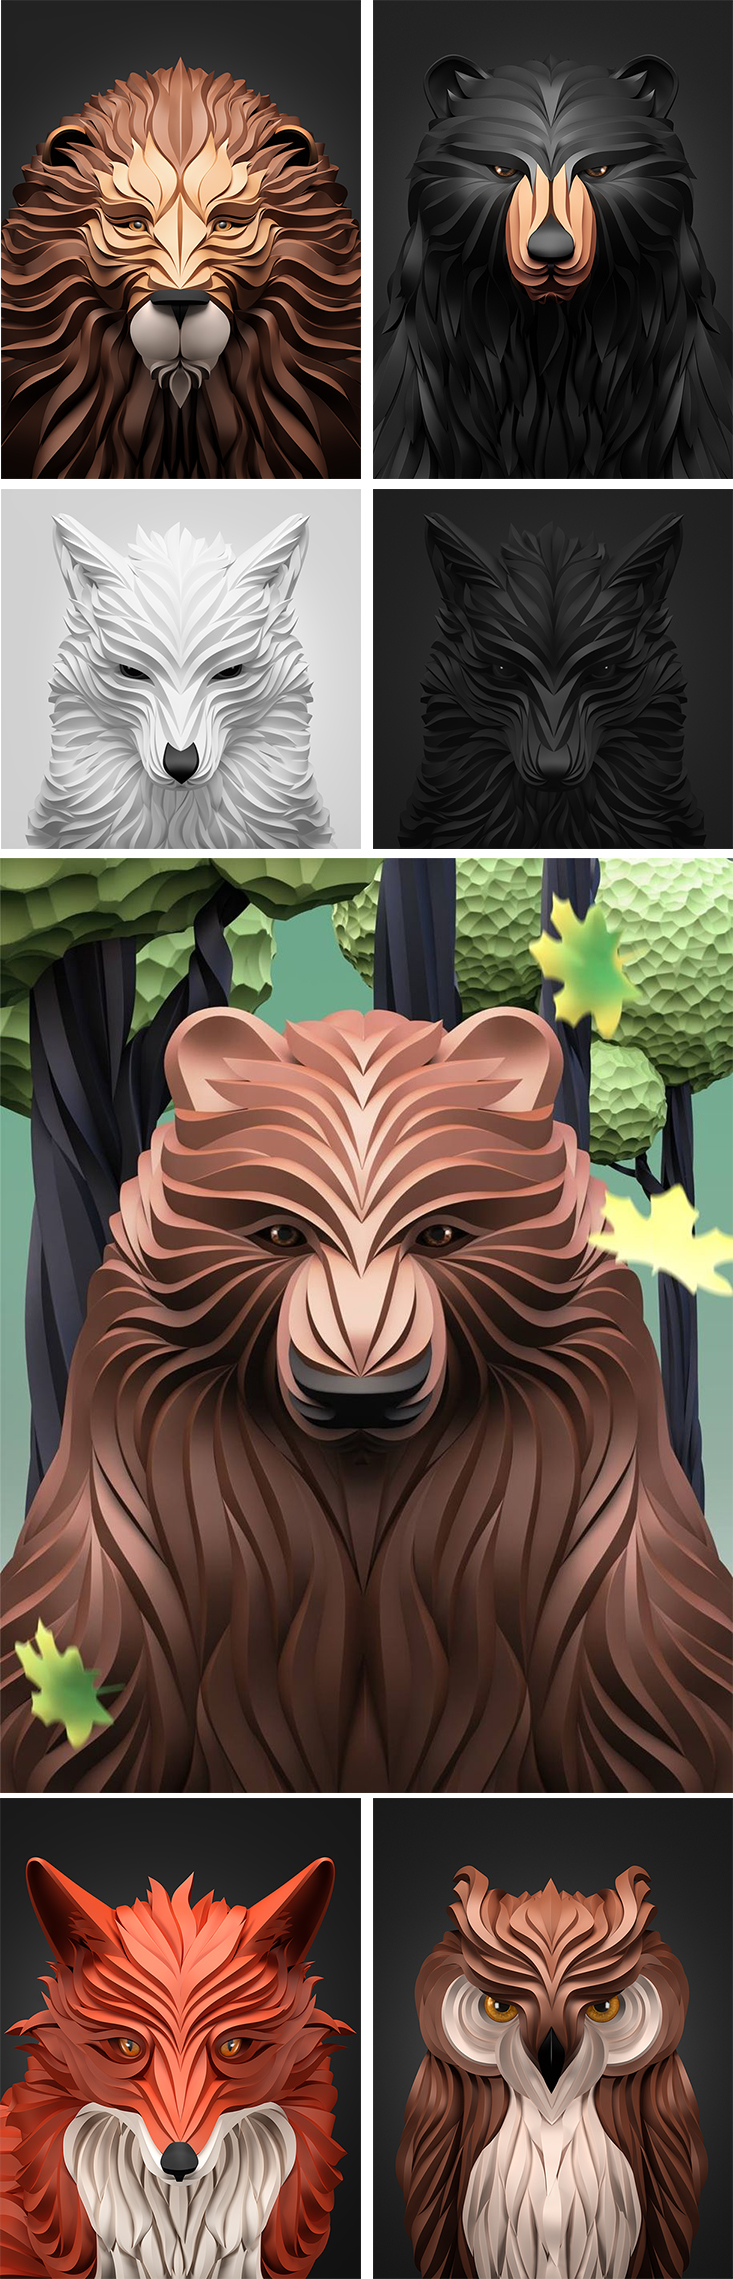 ikadia_articles_illustration-digitale-les-predators-de-maxim-shkret-photo1